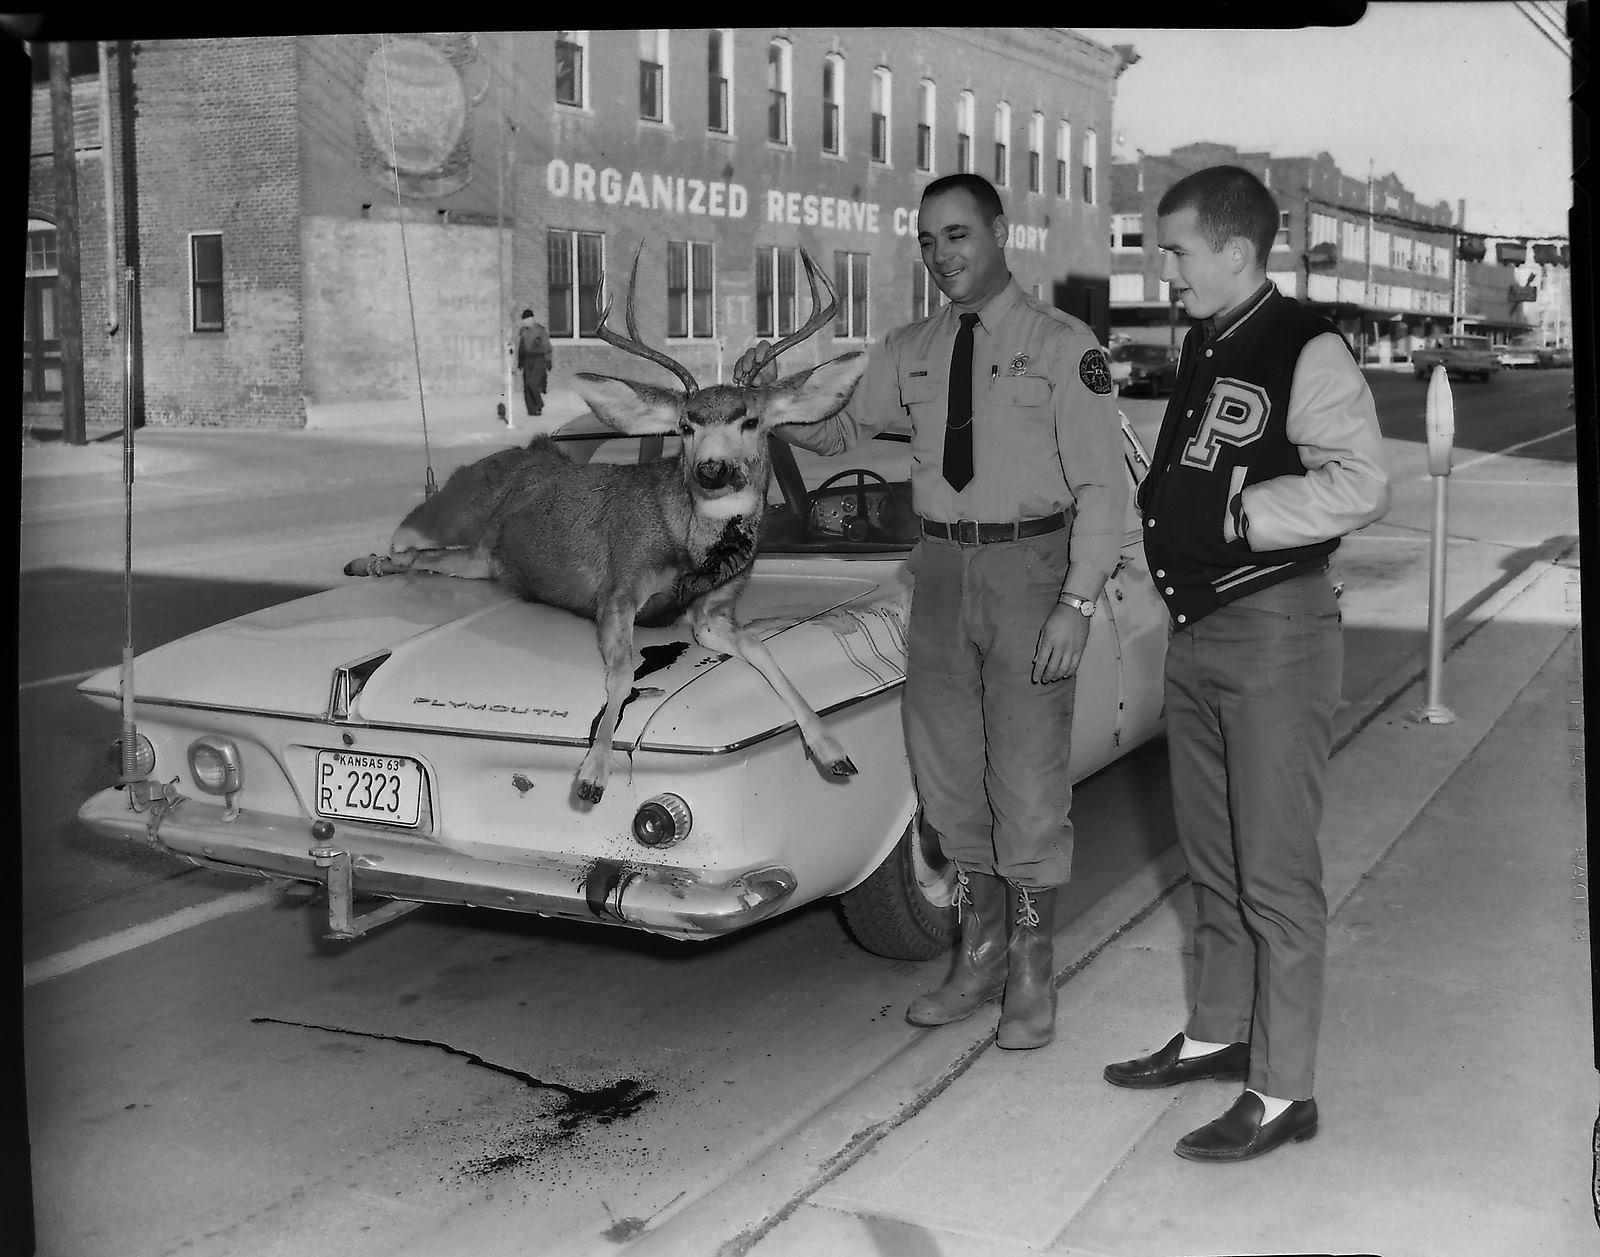 #98 TOMMY CRISPINO & JIM NICHOLS 1963 PARSONS, KS.